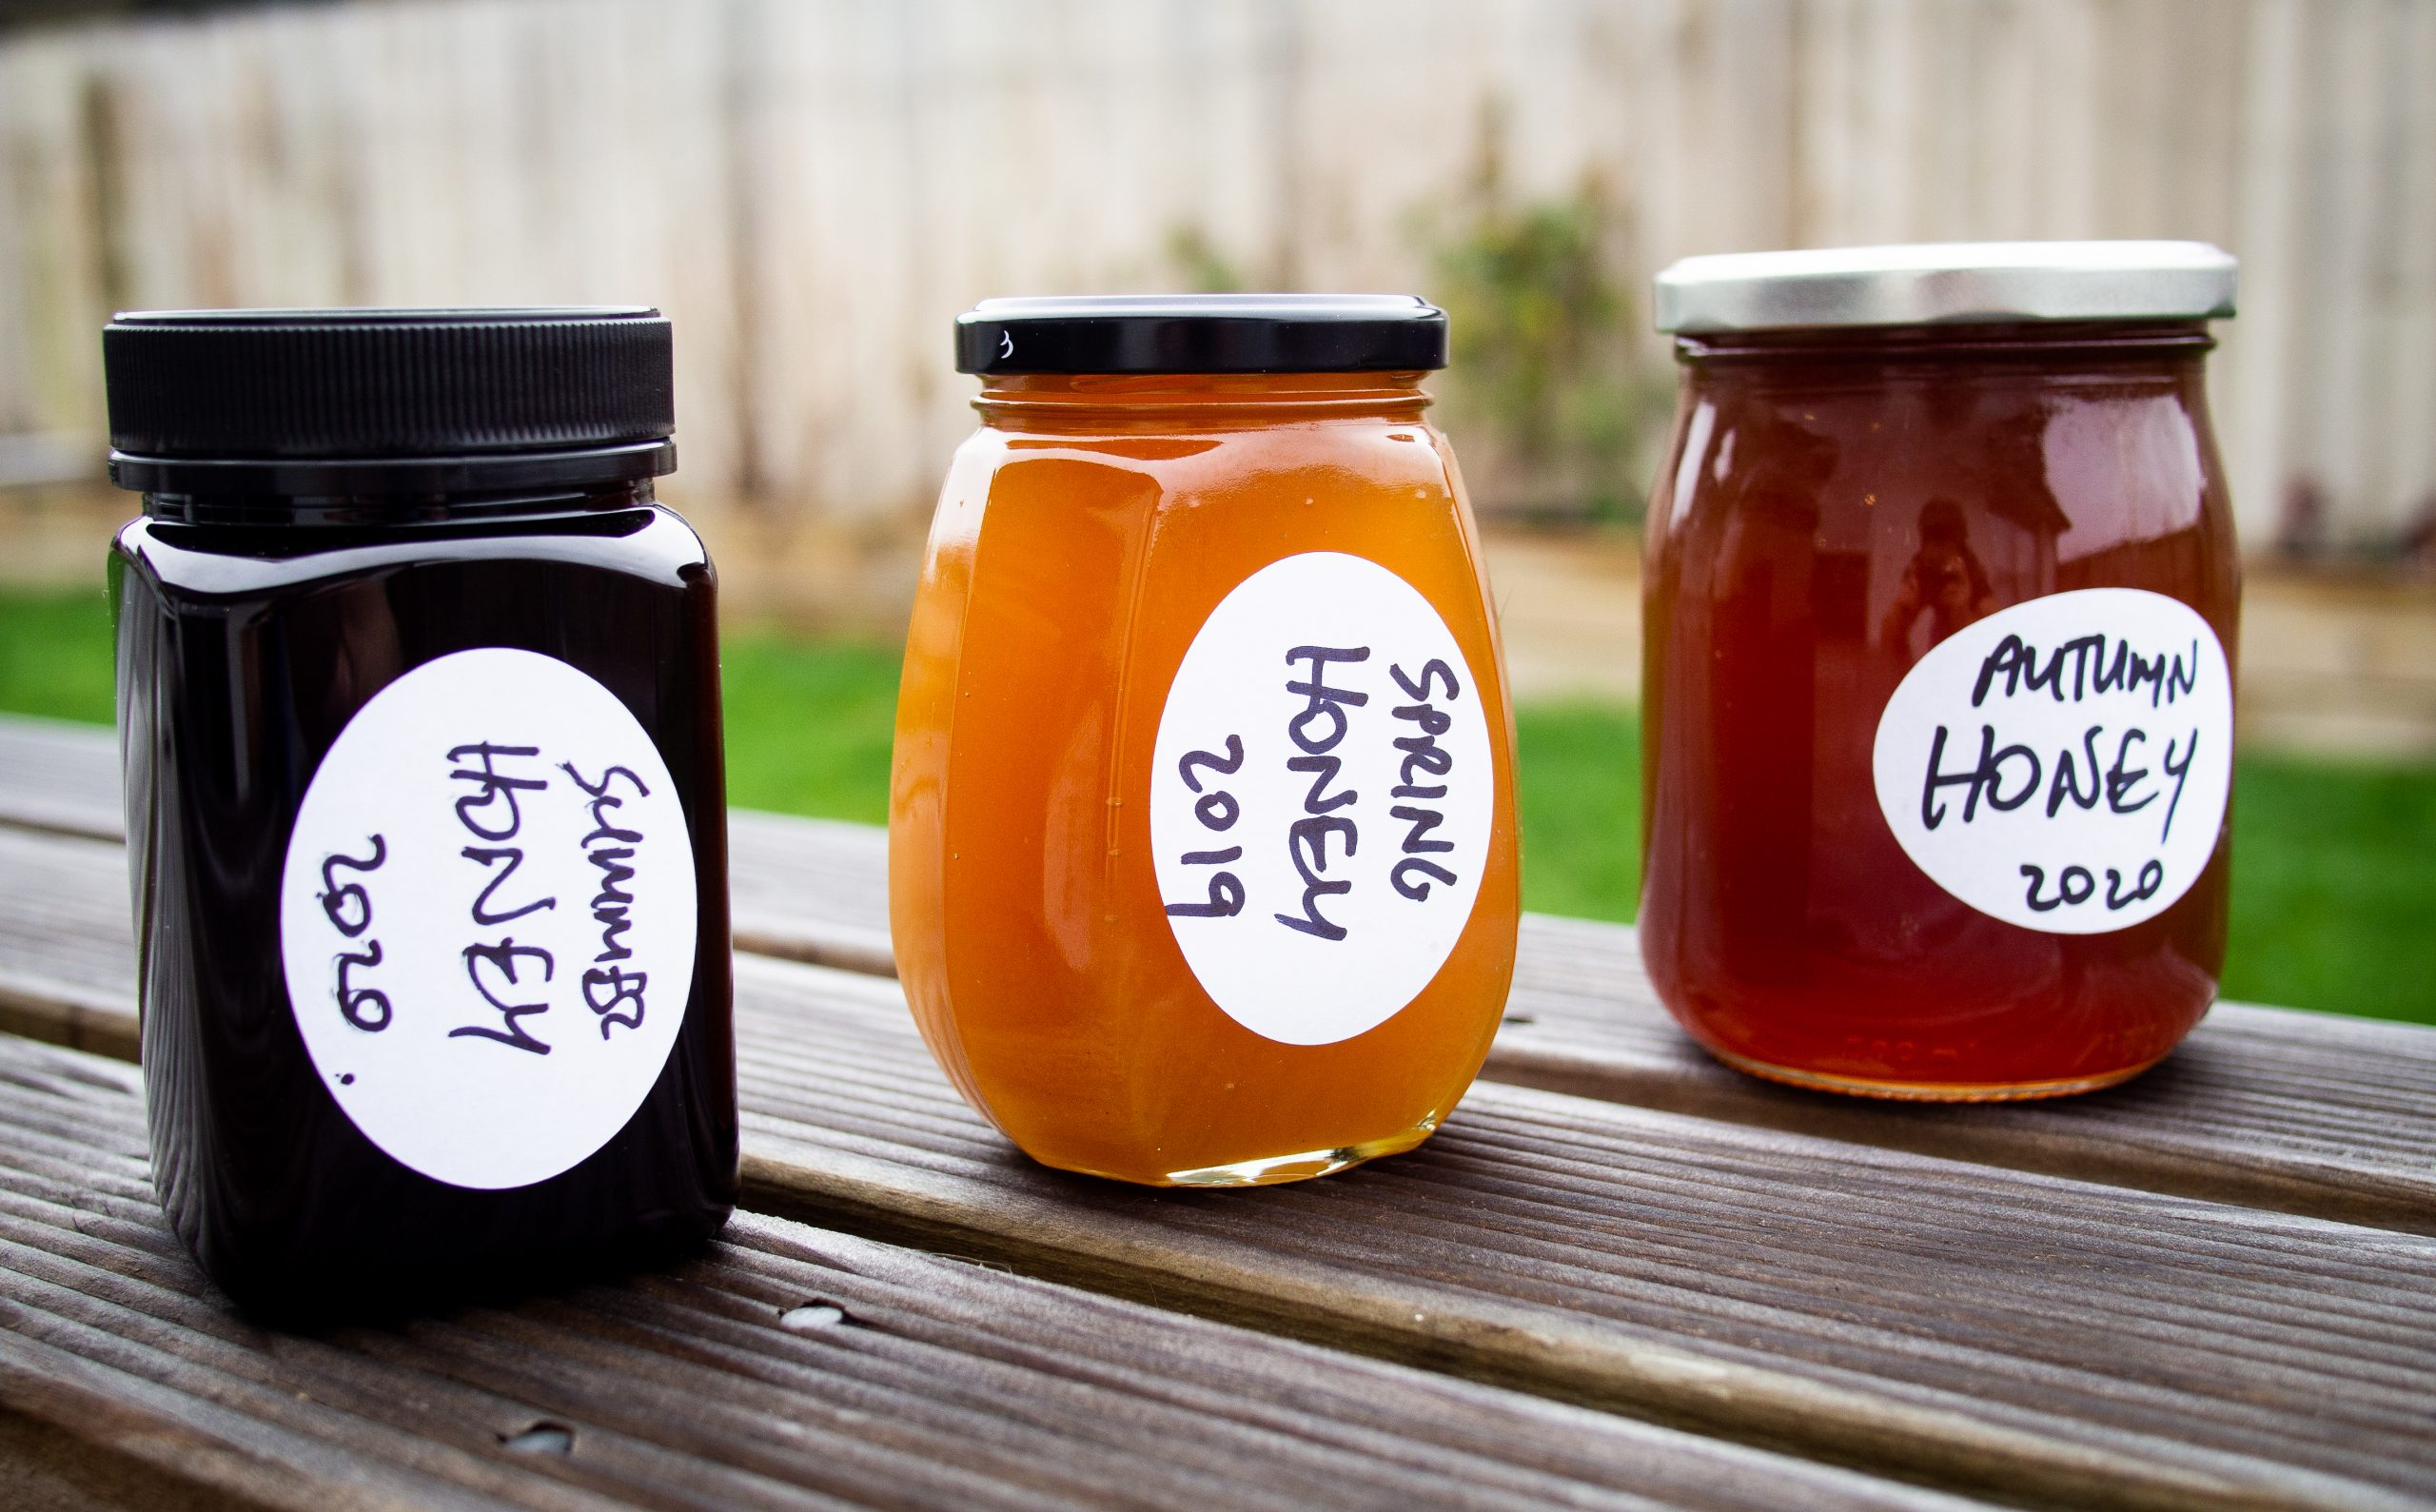 Abricot Ferme | Fresh-hop Apricot Sour